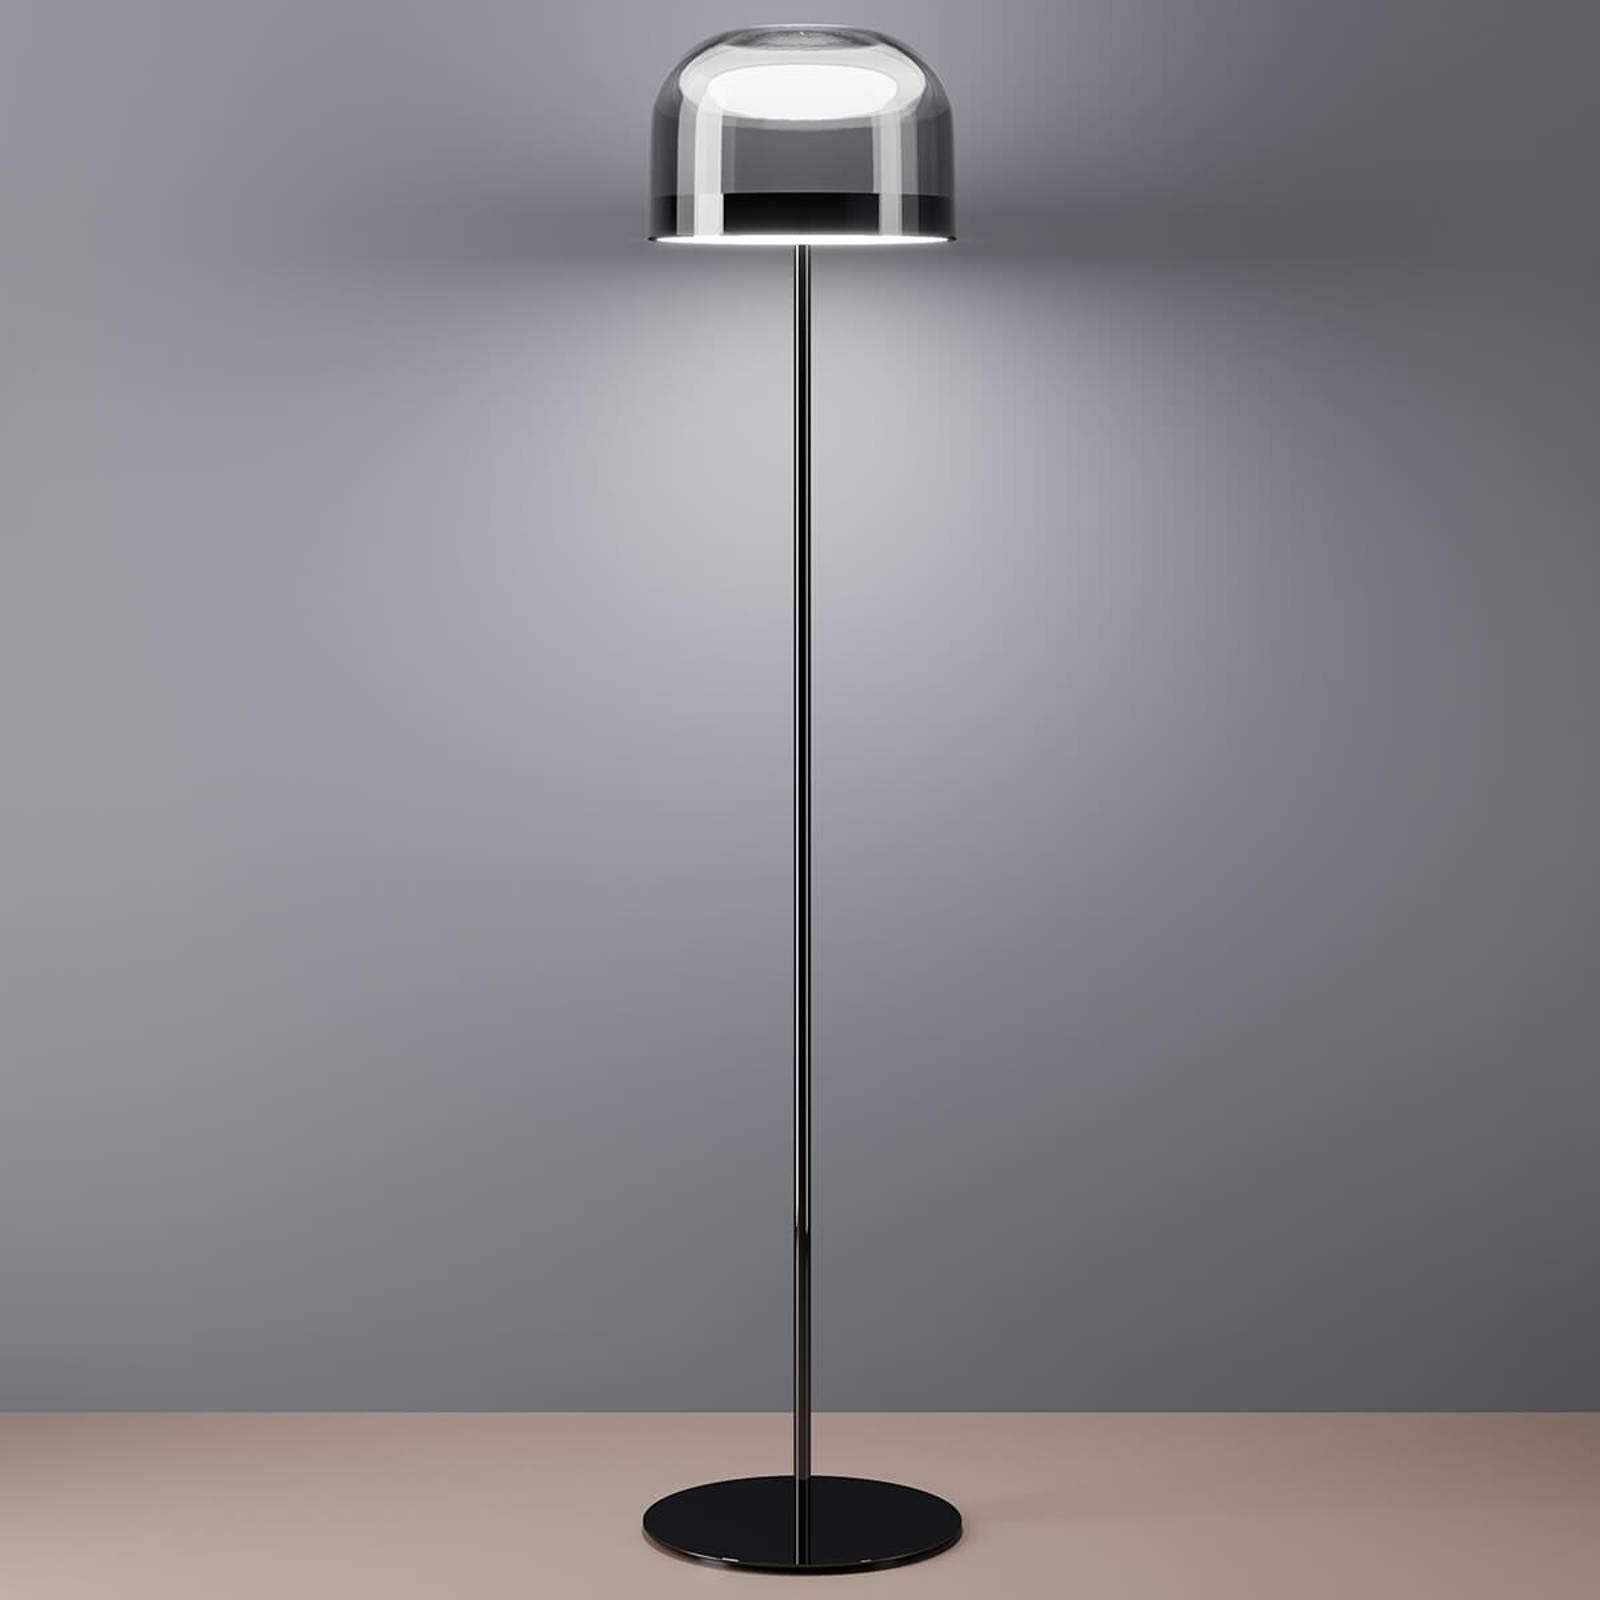 LED gulvlampe Equatore i krom, 135 cm